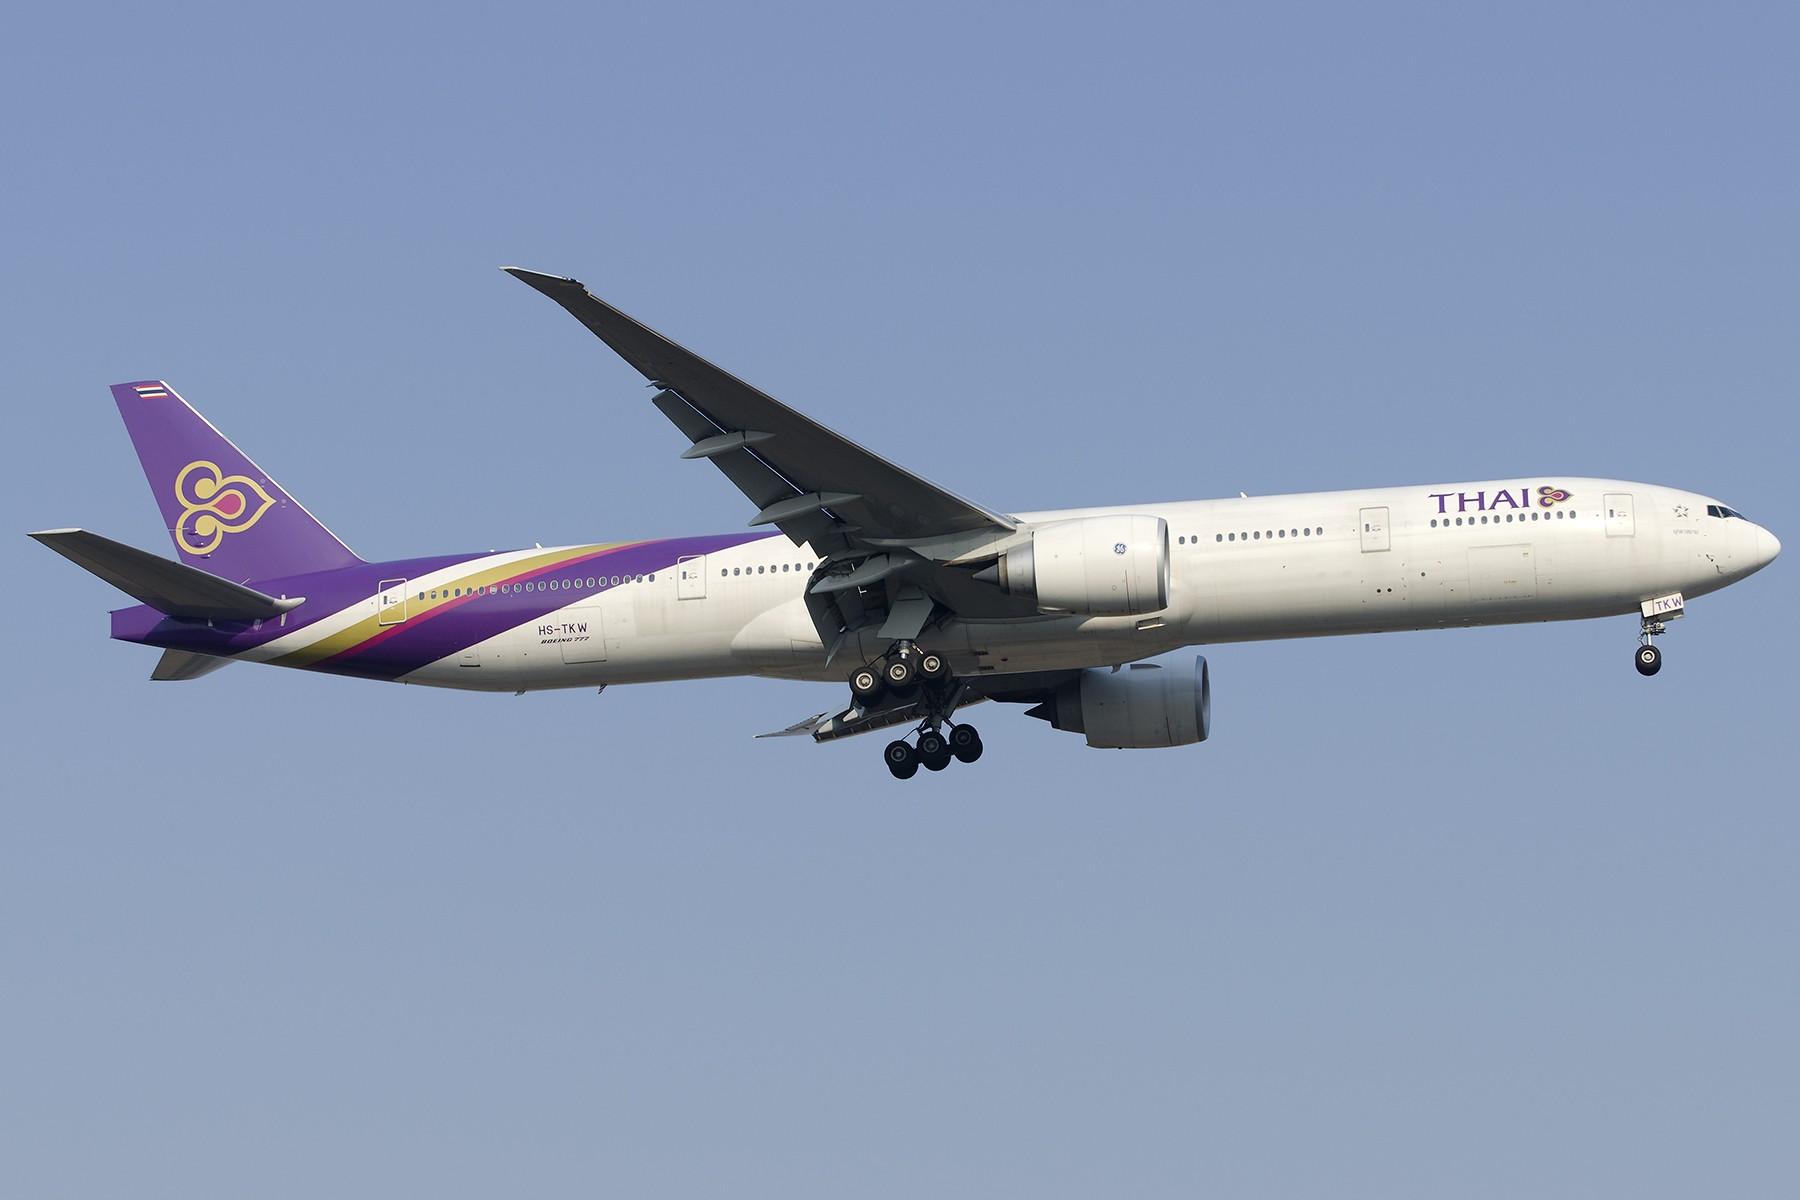 Re:[原创][原创]【PVG】好久没发图了,一堆库存(2)午后 BOEING 777-300ER HS-TKW 中国上海浦东国际机场